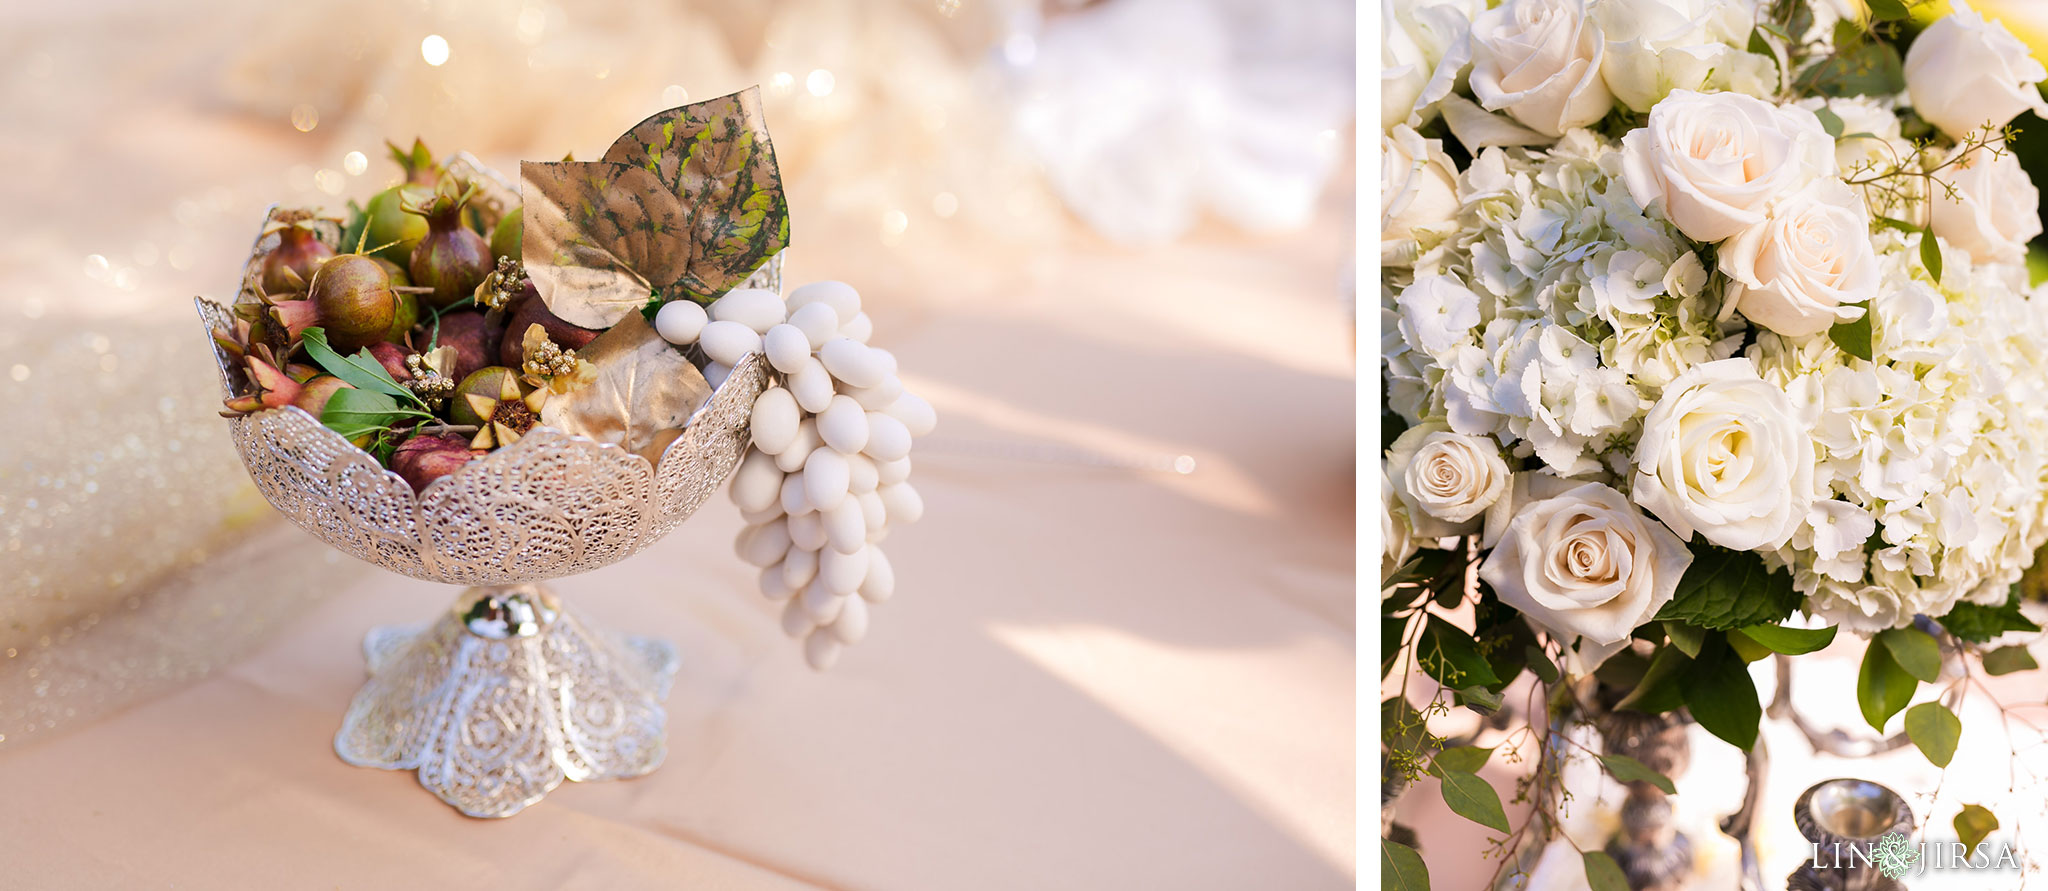 013 taglyan complex los angeles persian wedding photography